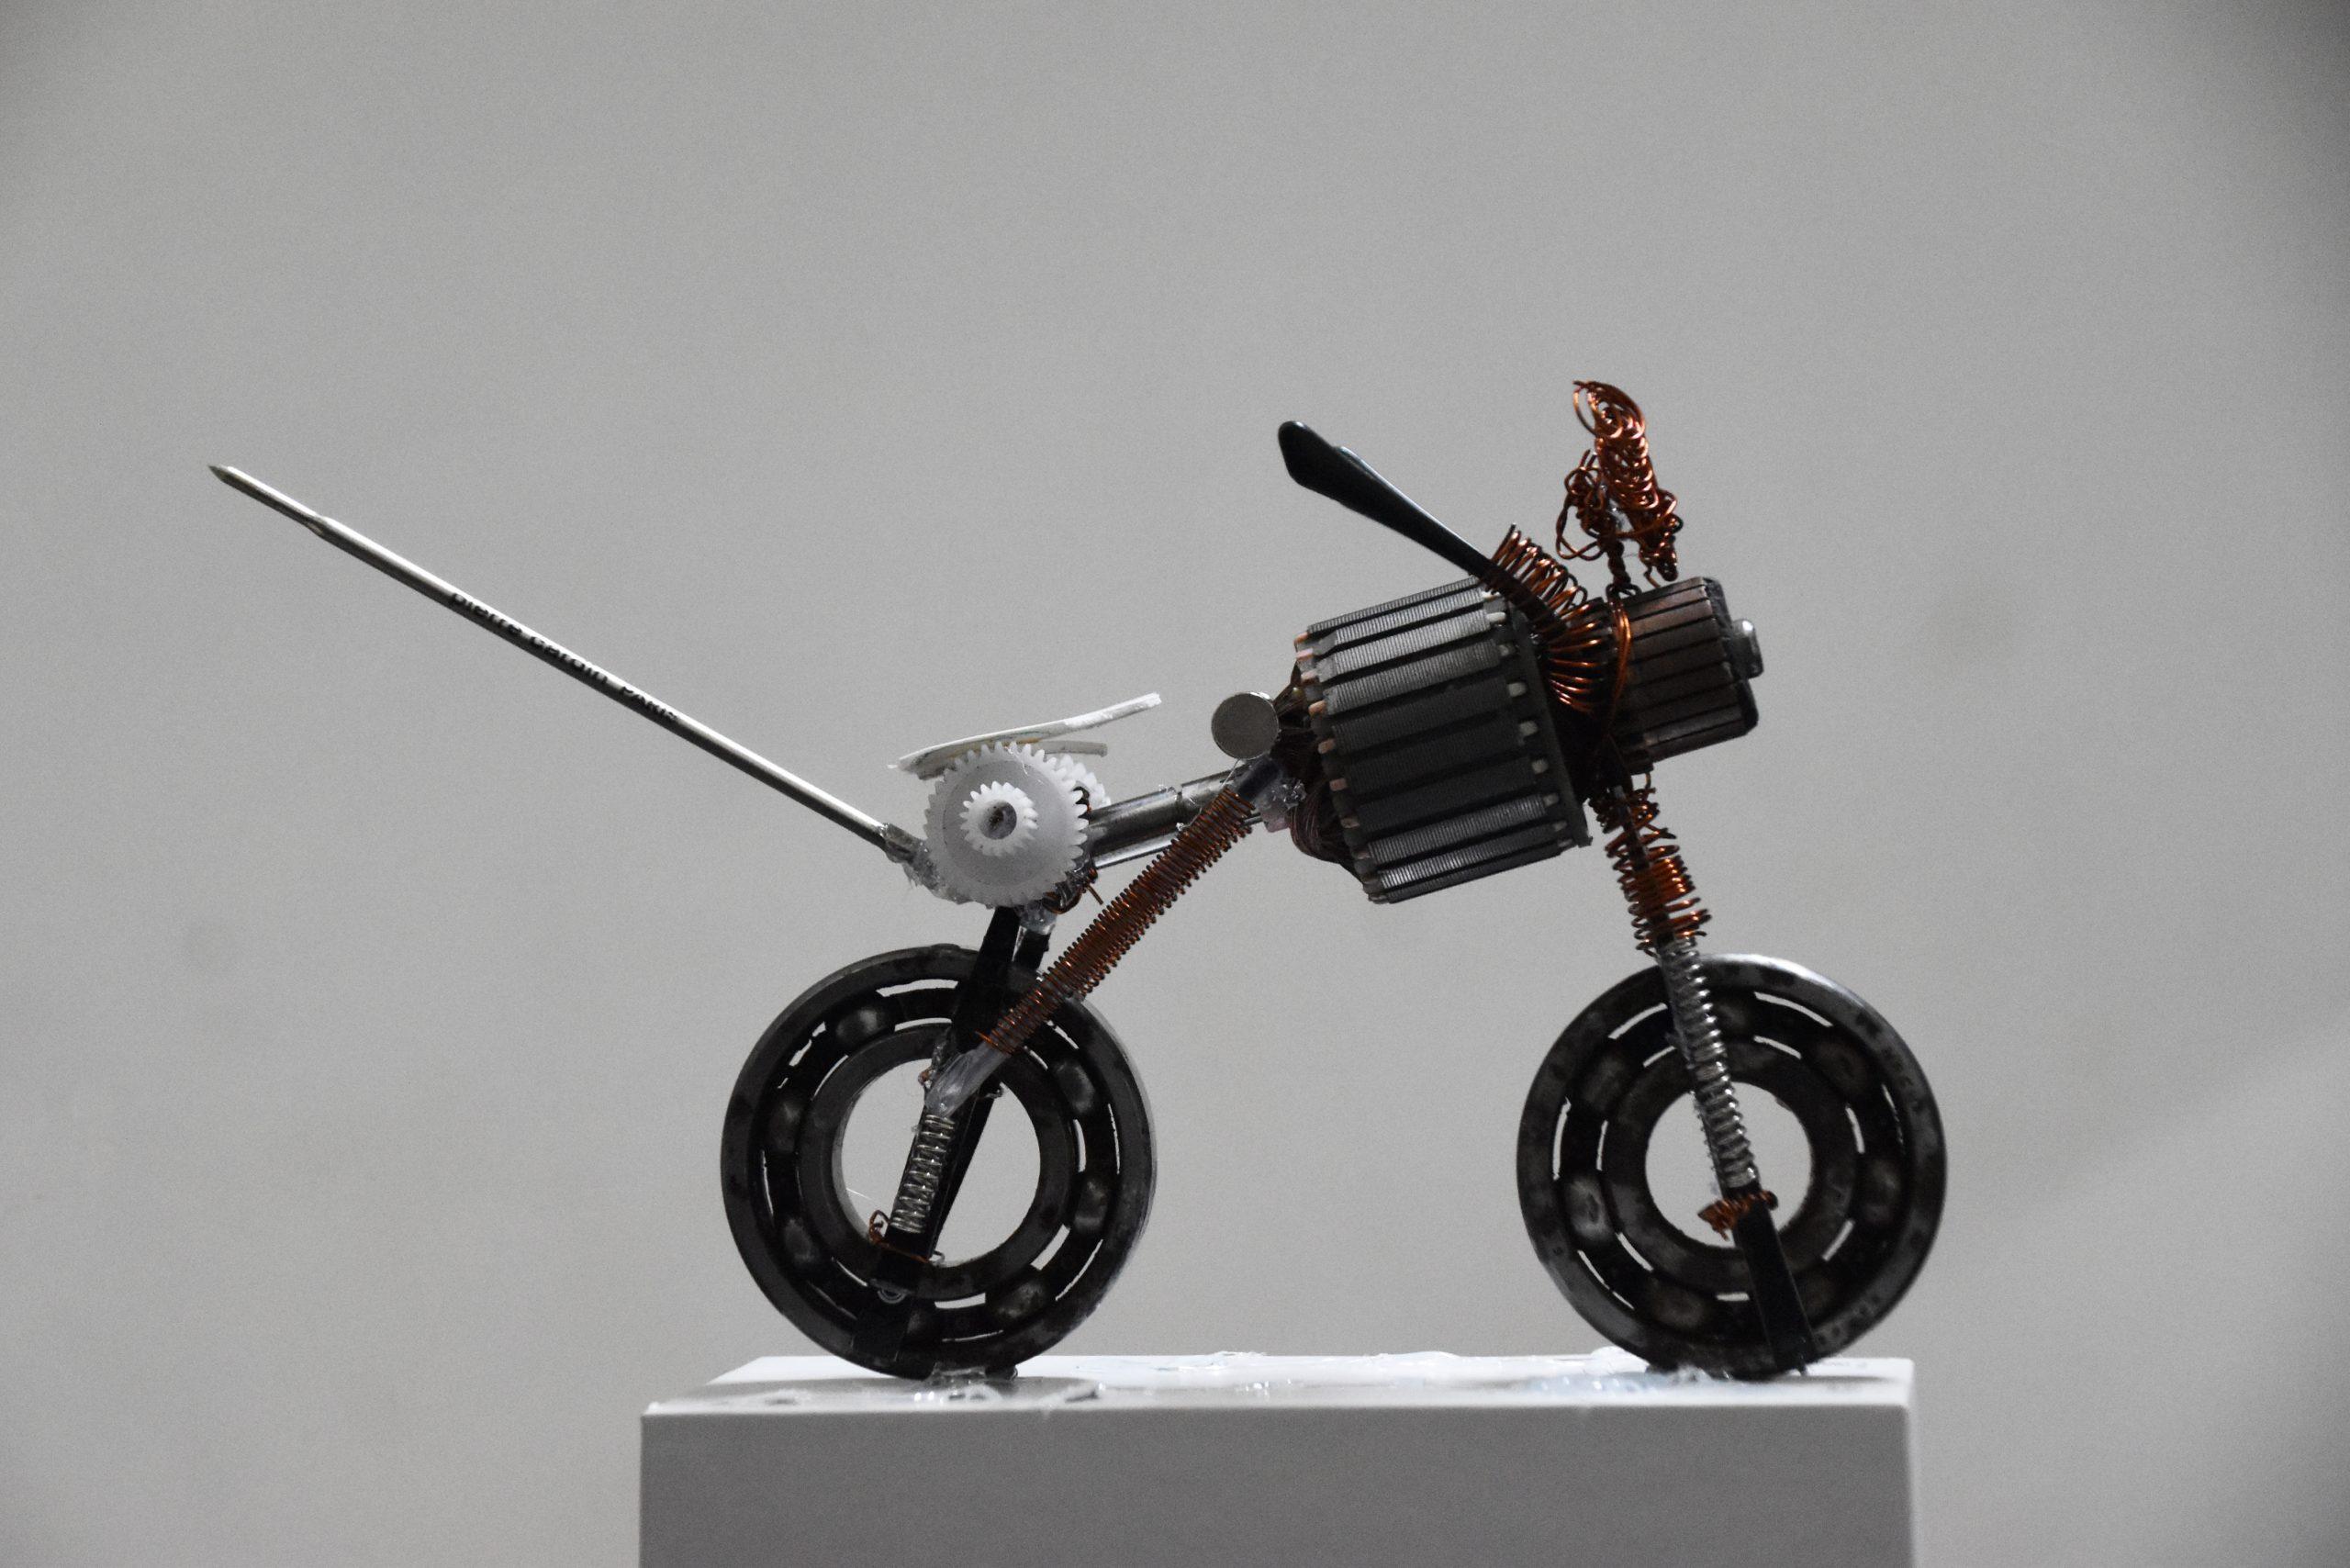 A custom bike made with gears and bearings